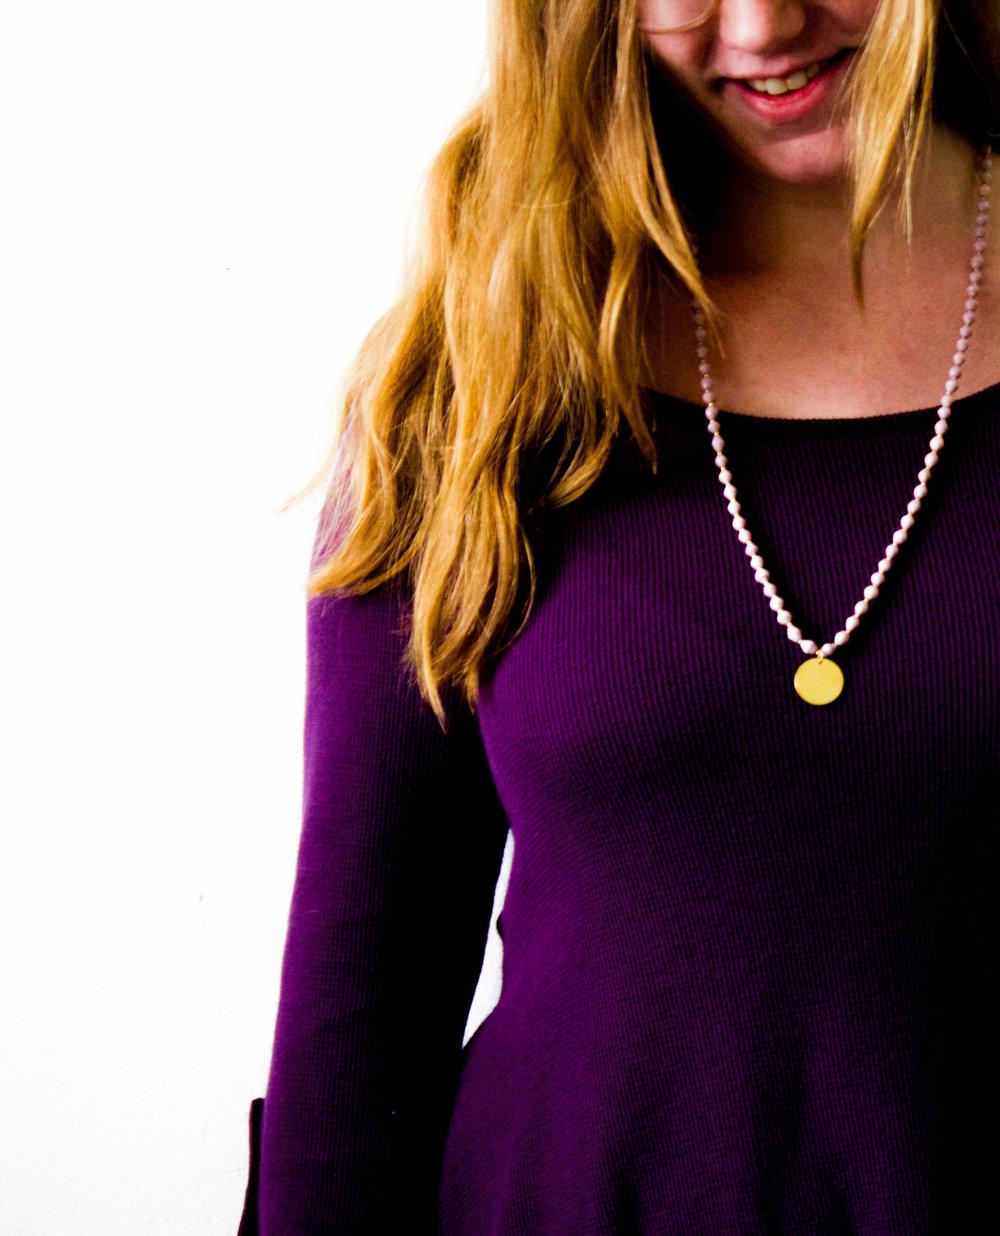 The Eden Necklace by Landmine Design